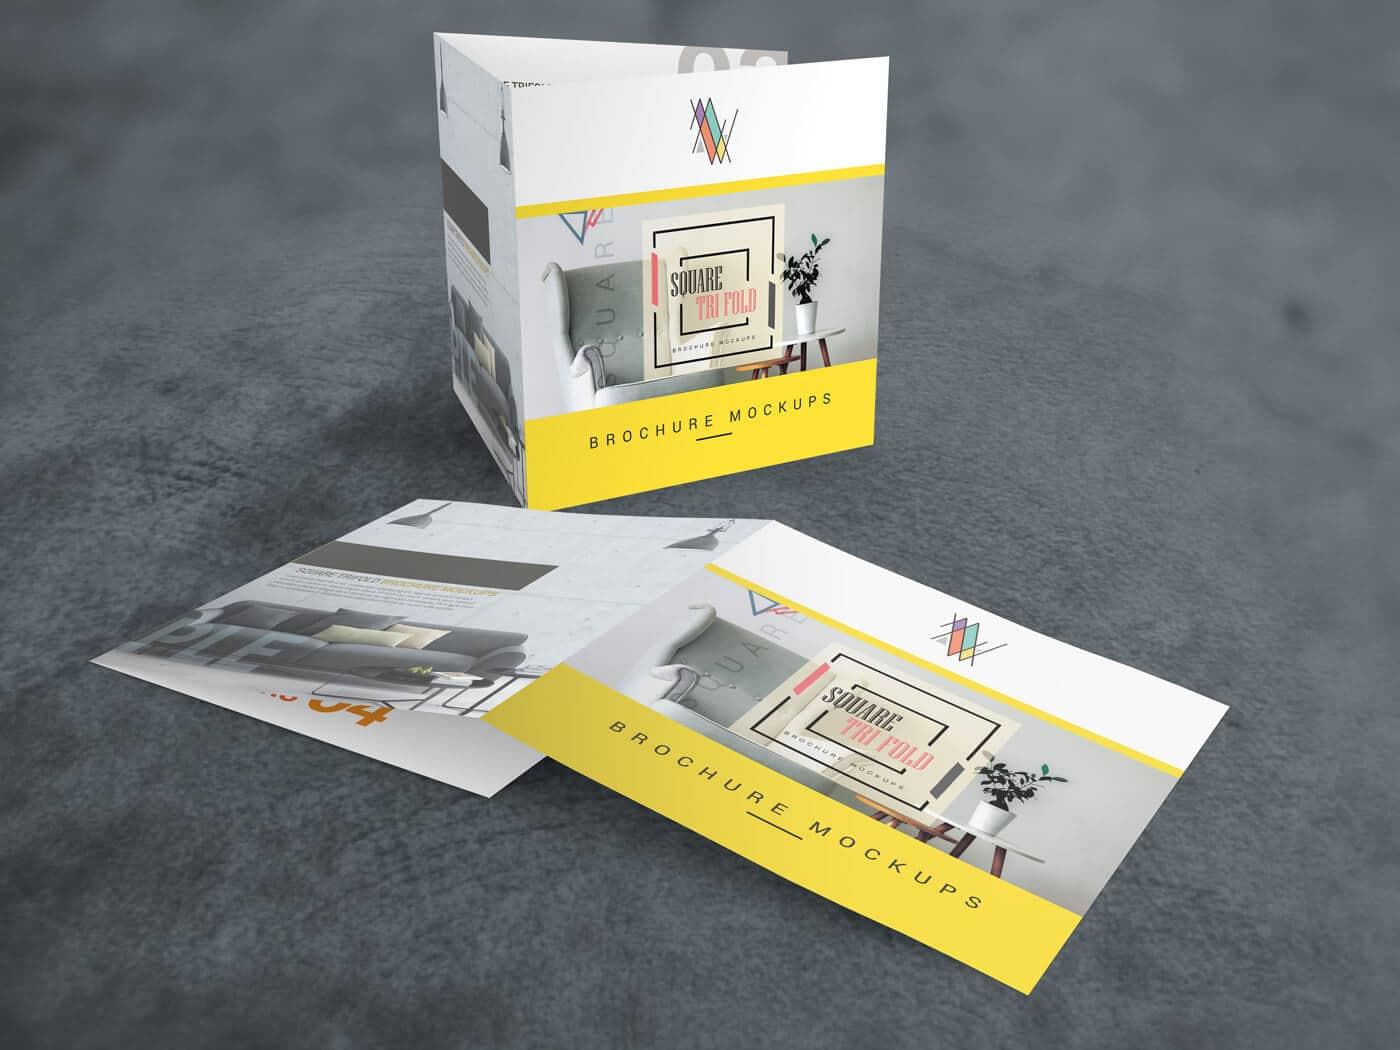 Square-Trifold-Brochure-Mockups-01